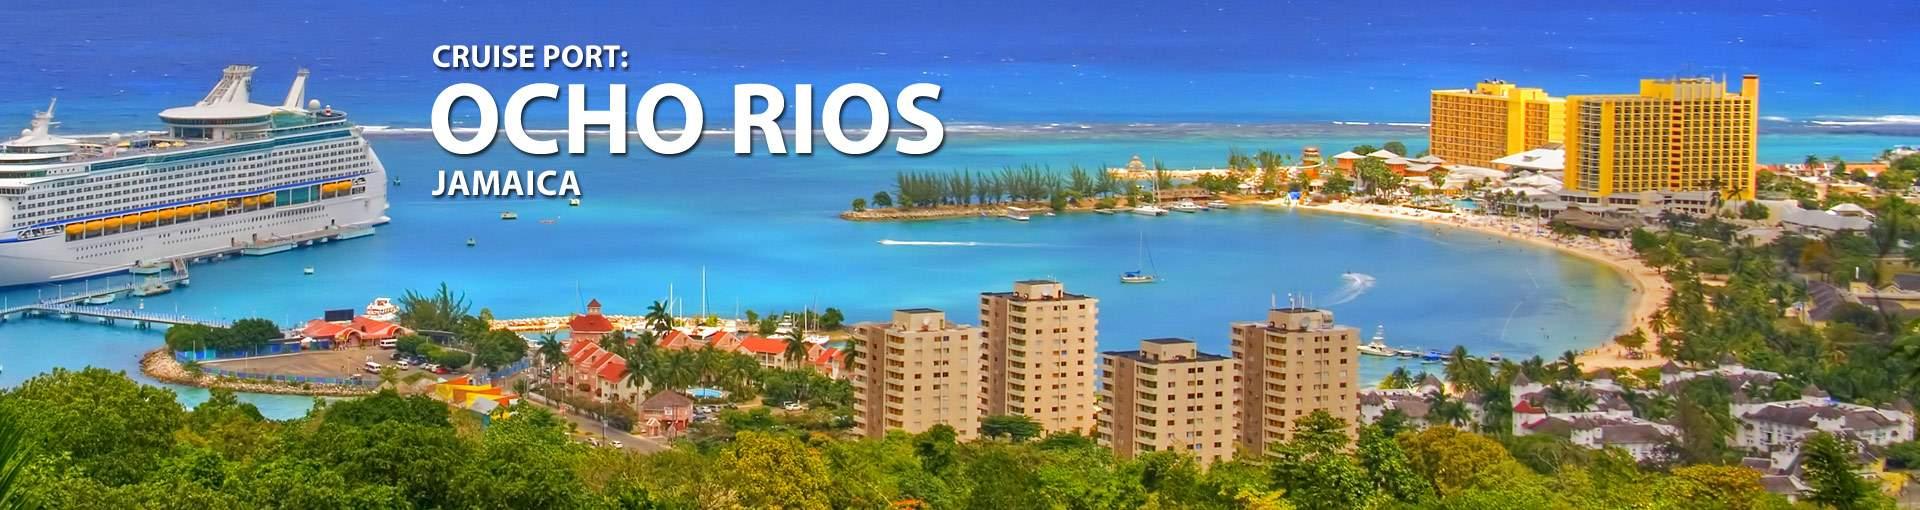 Cruises to Ocho Rios, Jamaica